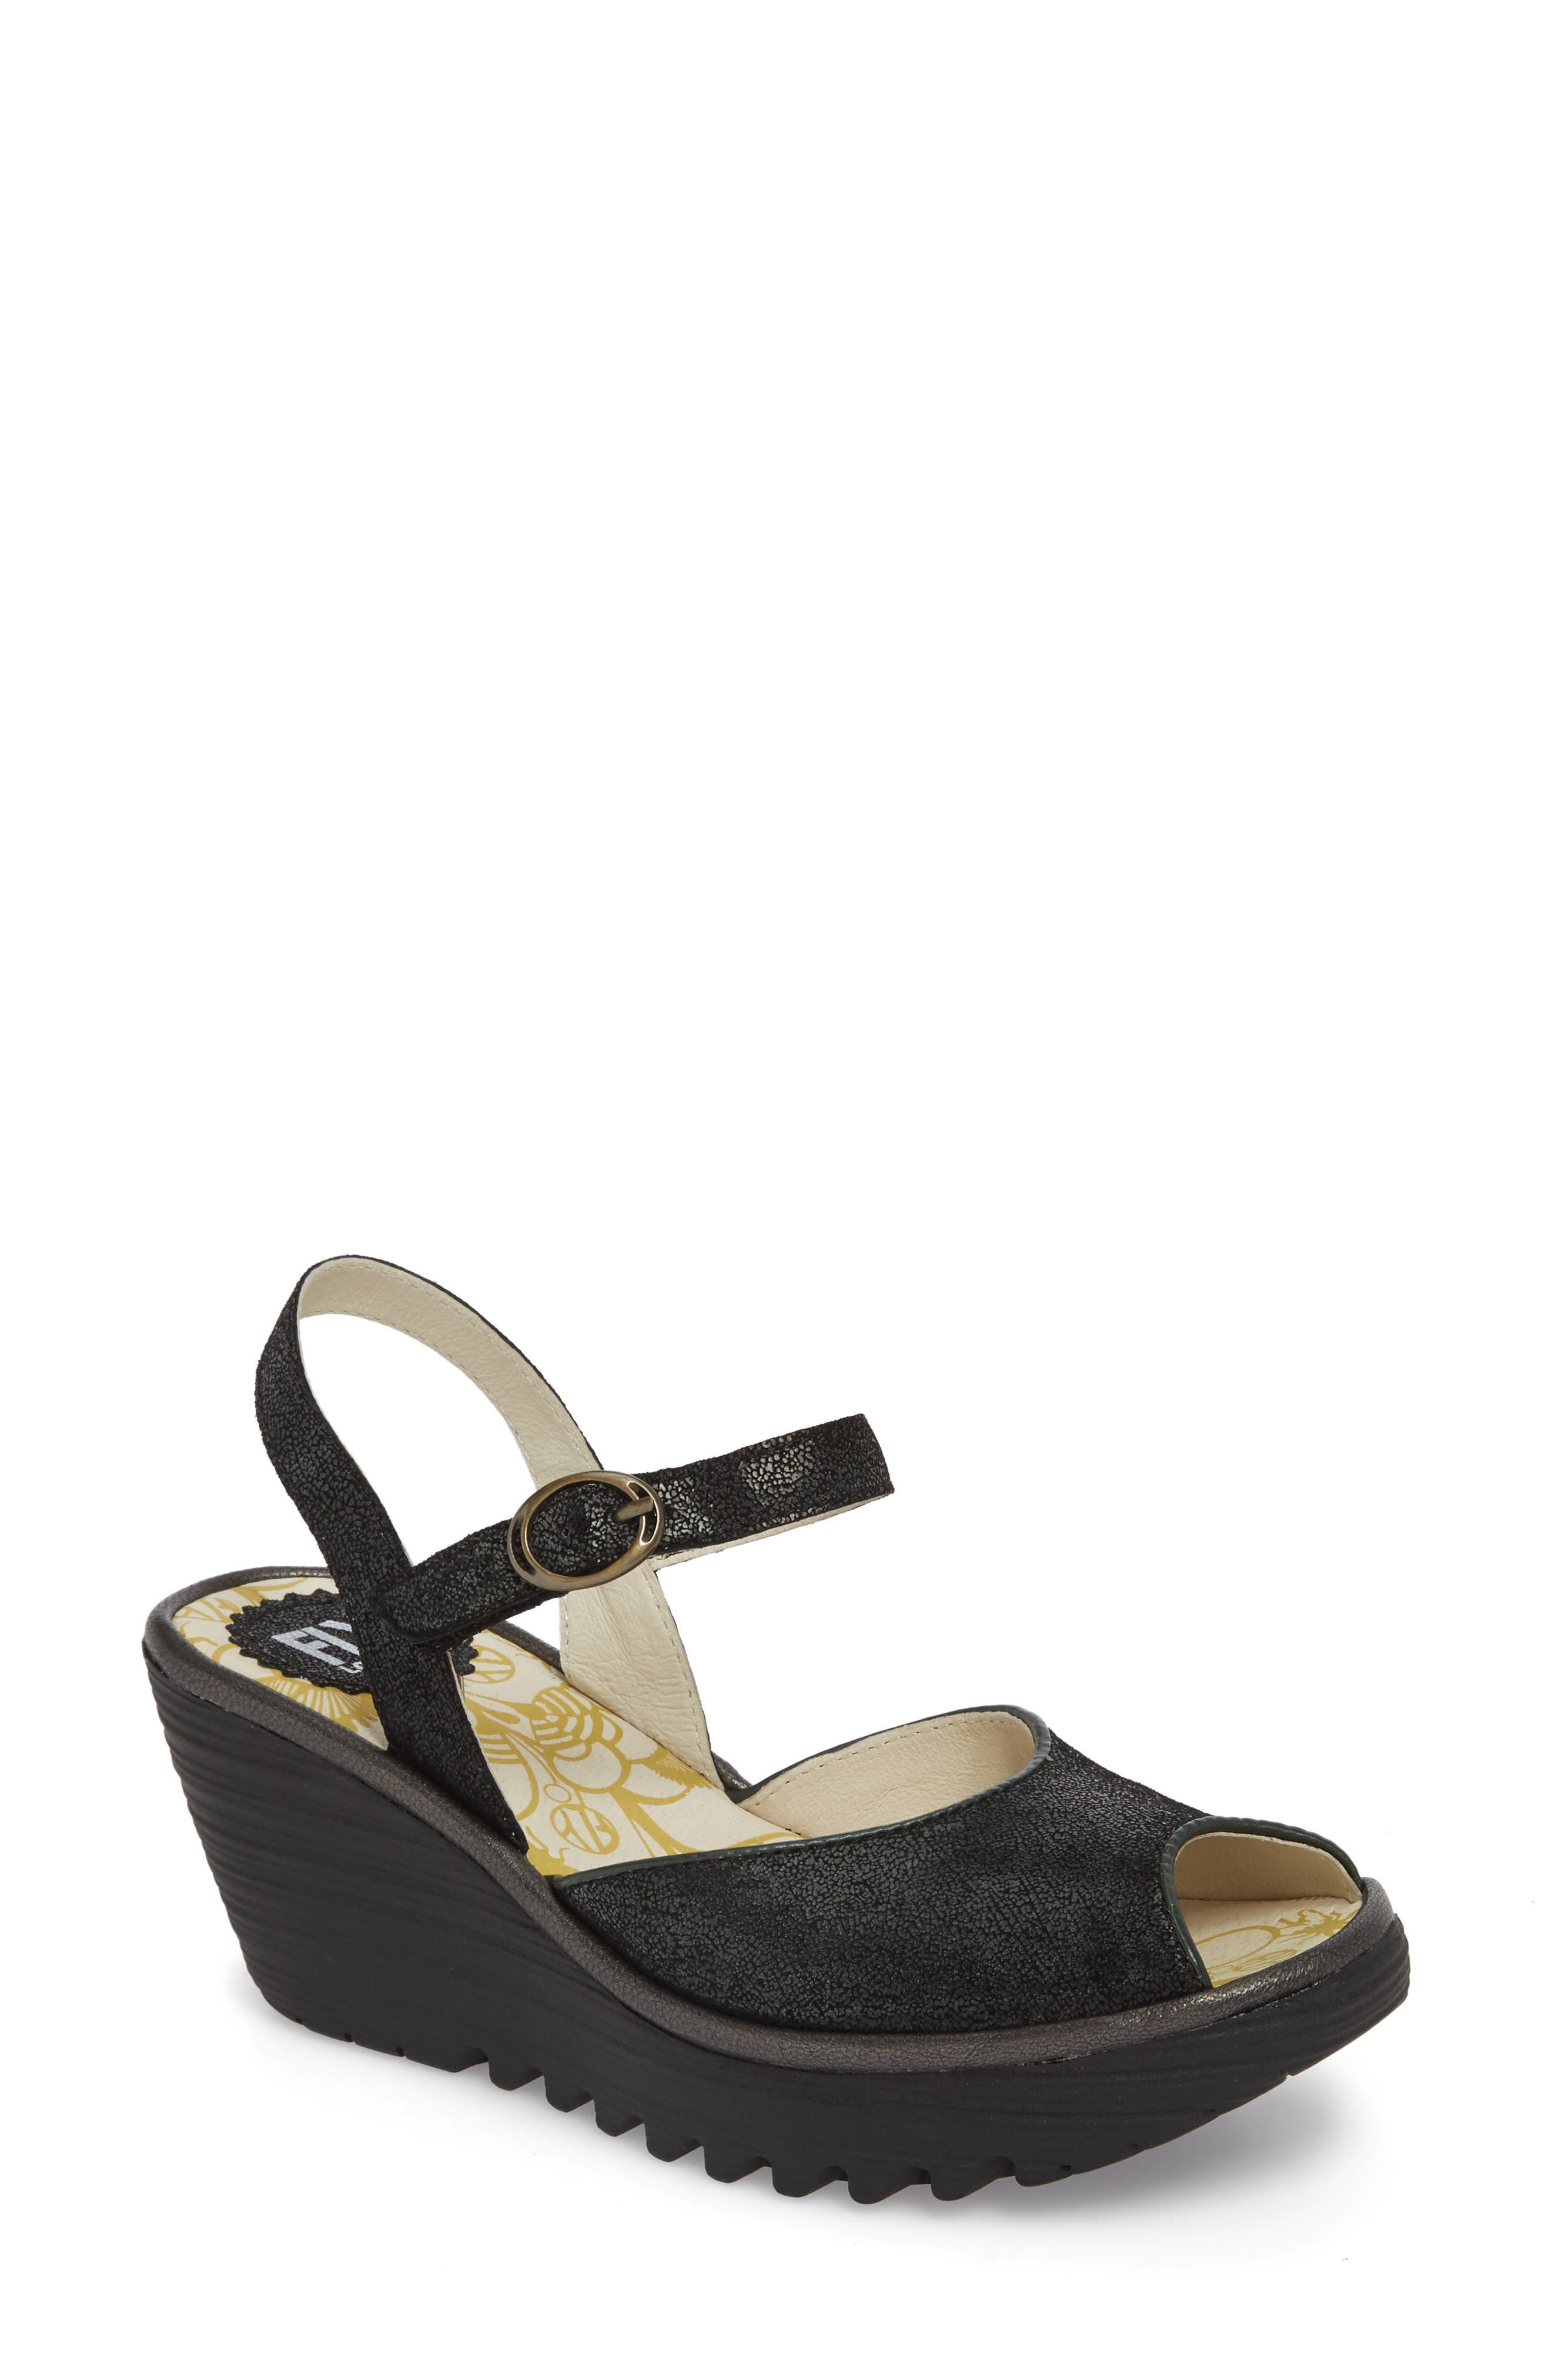 Yora Wedge Sandal,                         Main,                         color, Black/ Graphite Leather